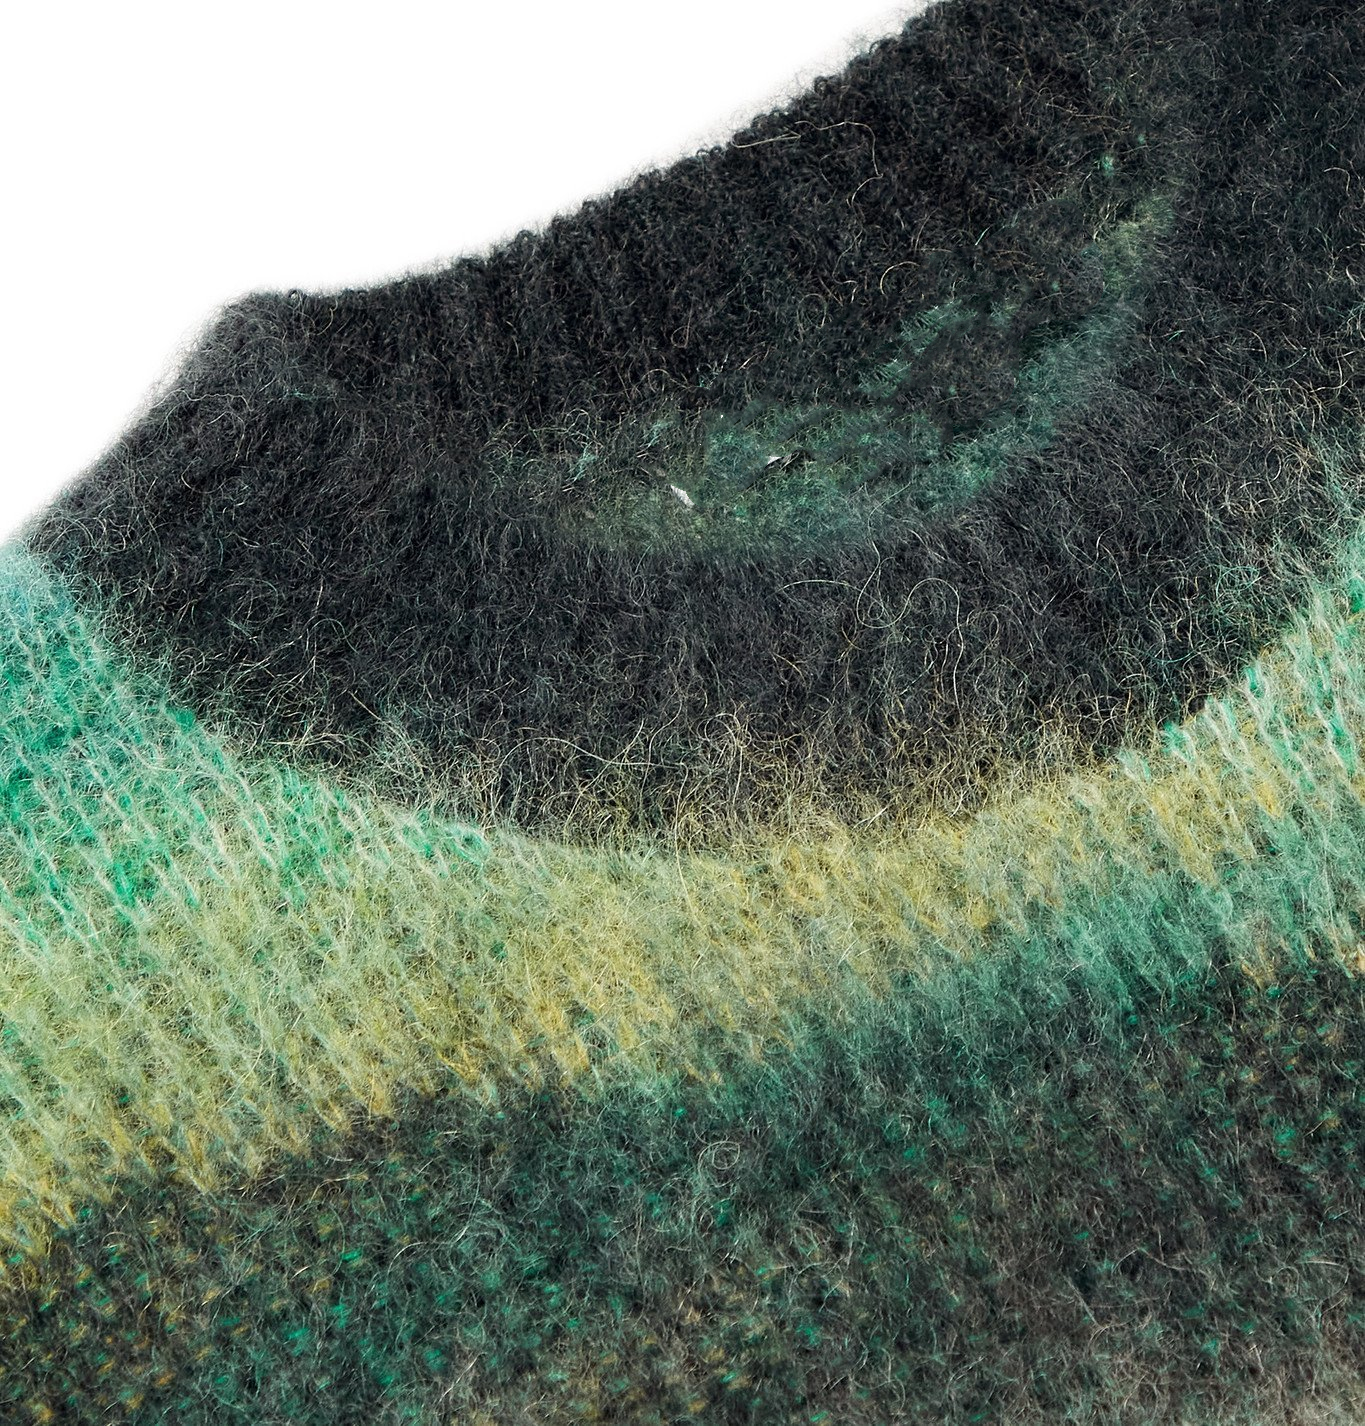 2021 Custom OEM & ODM mohair men sweater Fuzzy Jacquard knit pullovers knitwear winter crewneck knitted designer sweater for men